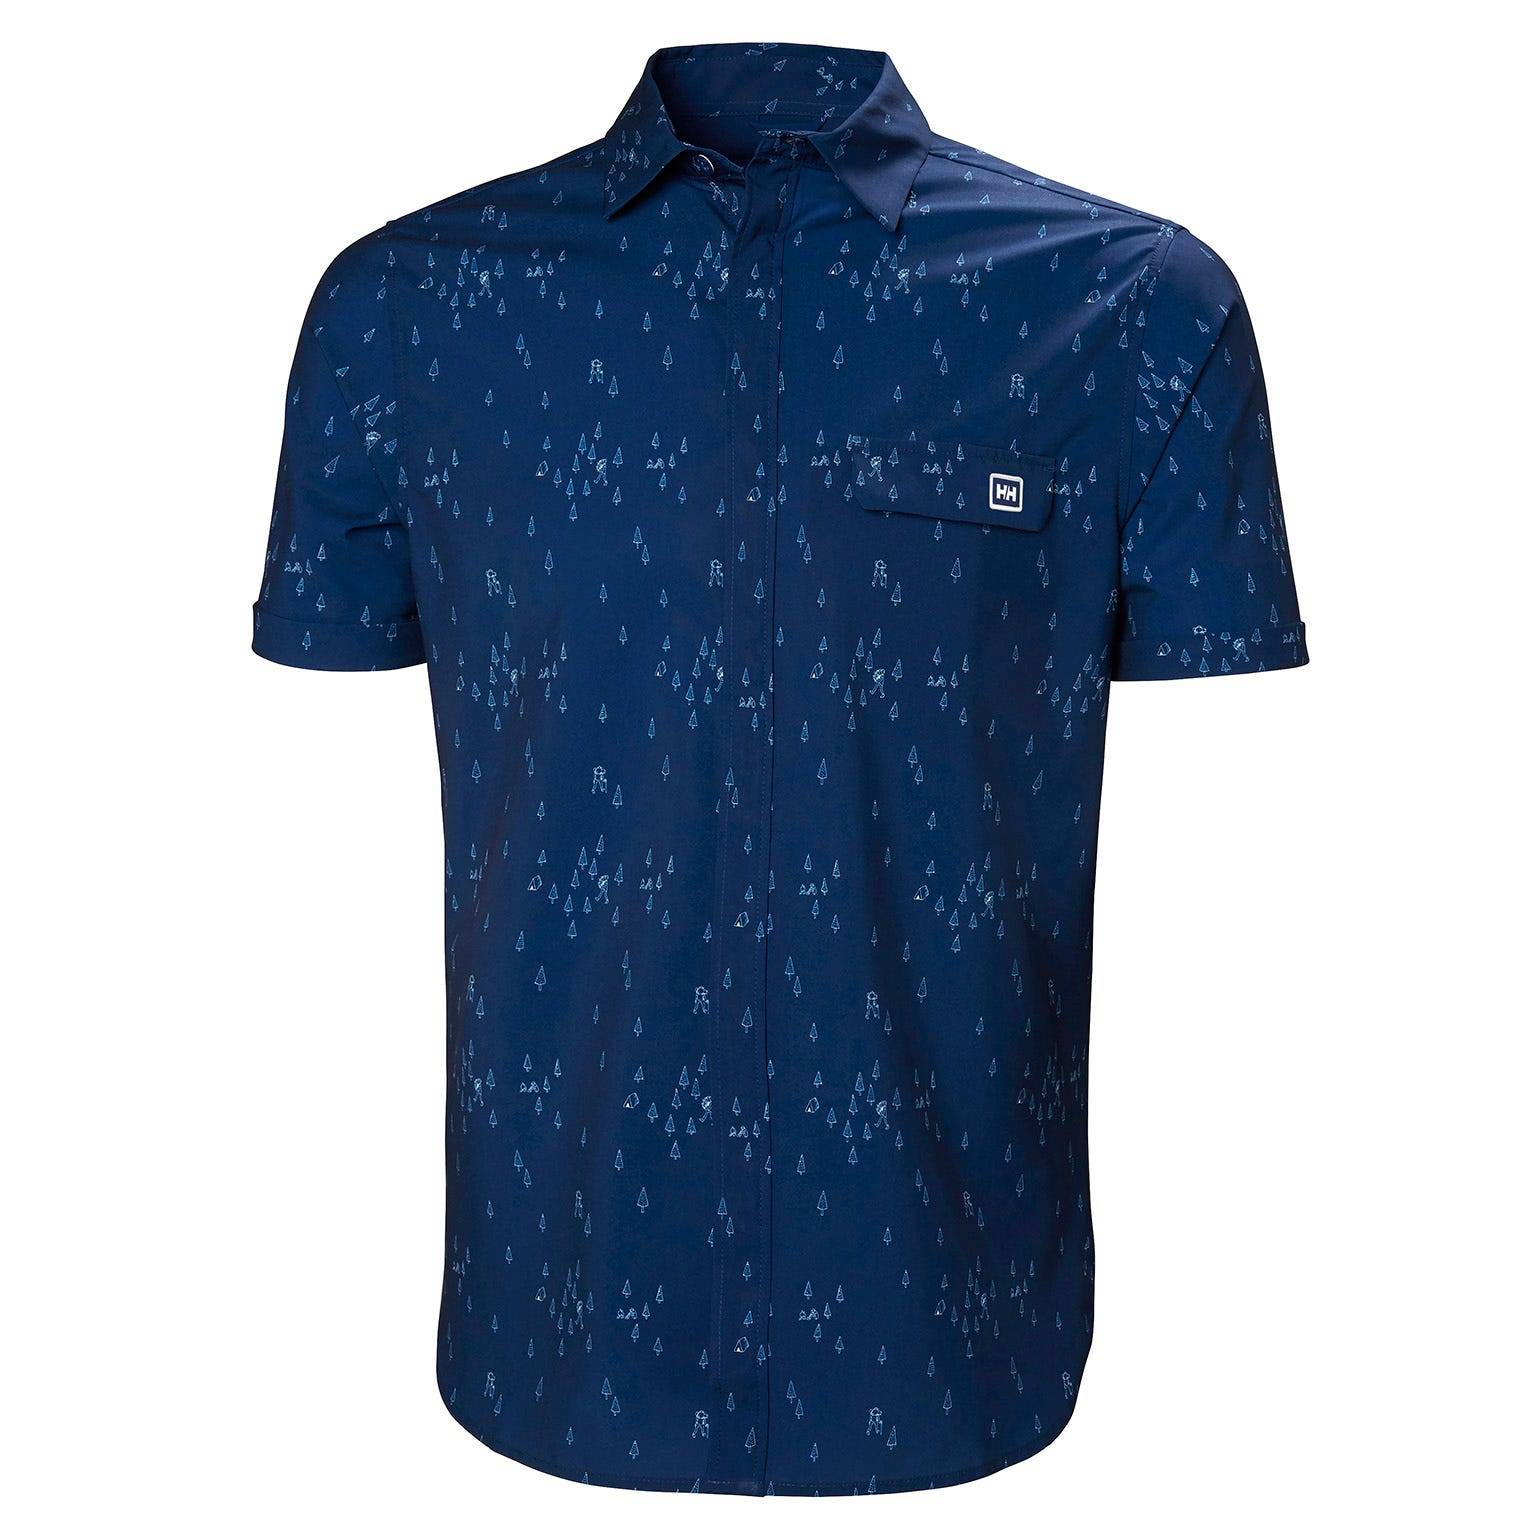 Helly Hansen Oya Shirt Mens Midlayer Blue L